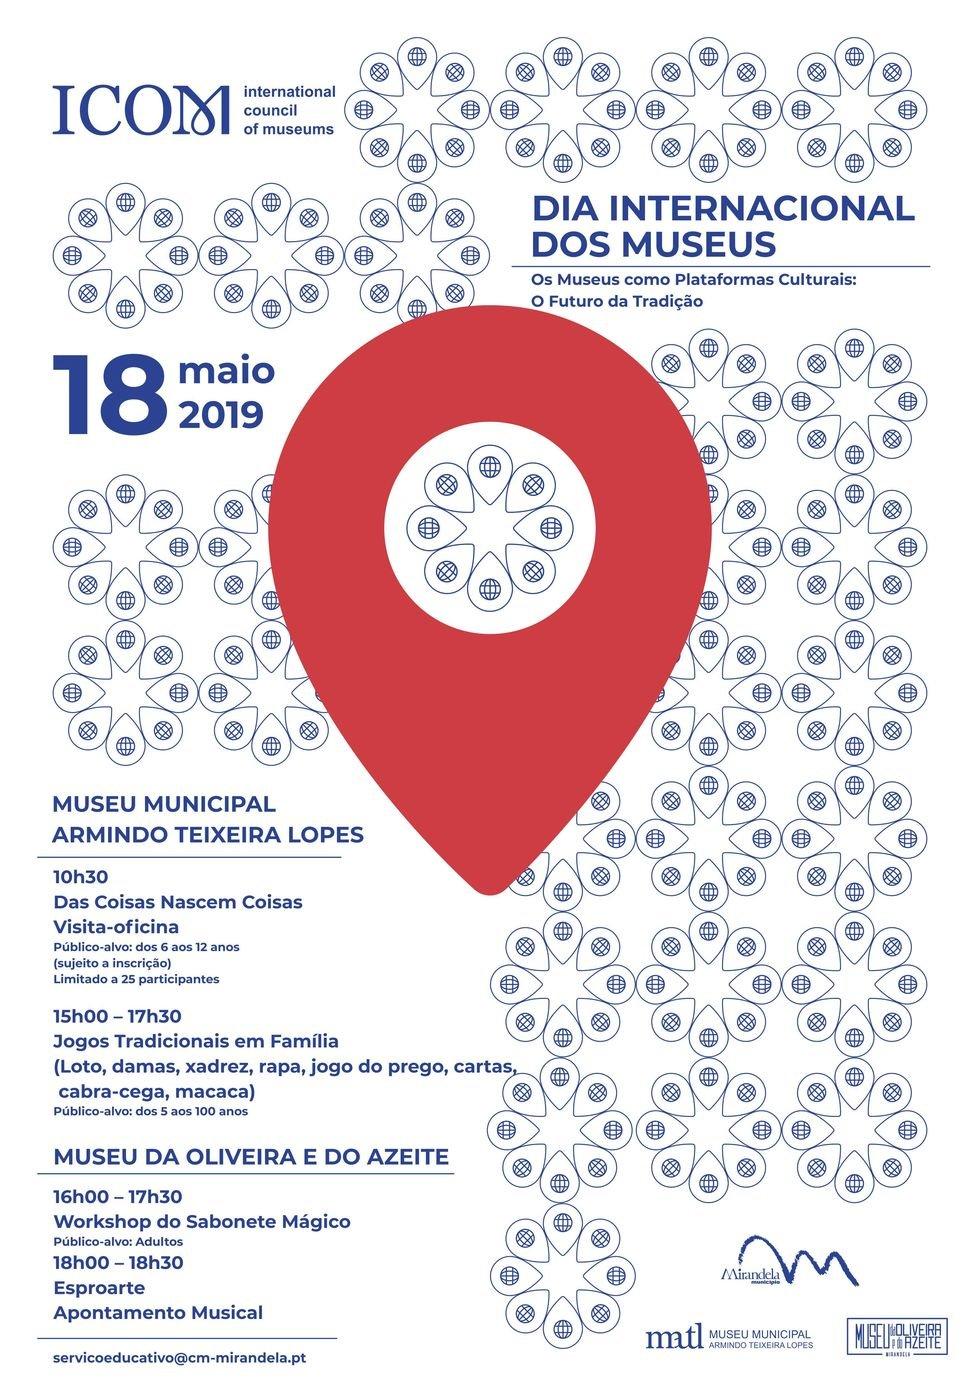 Dia Internacional dos Museus 2019